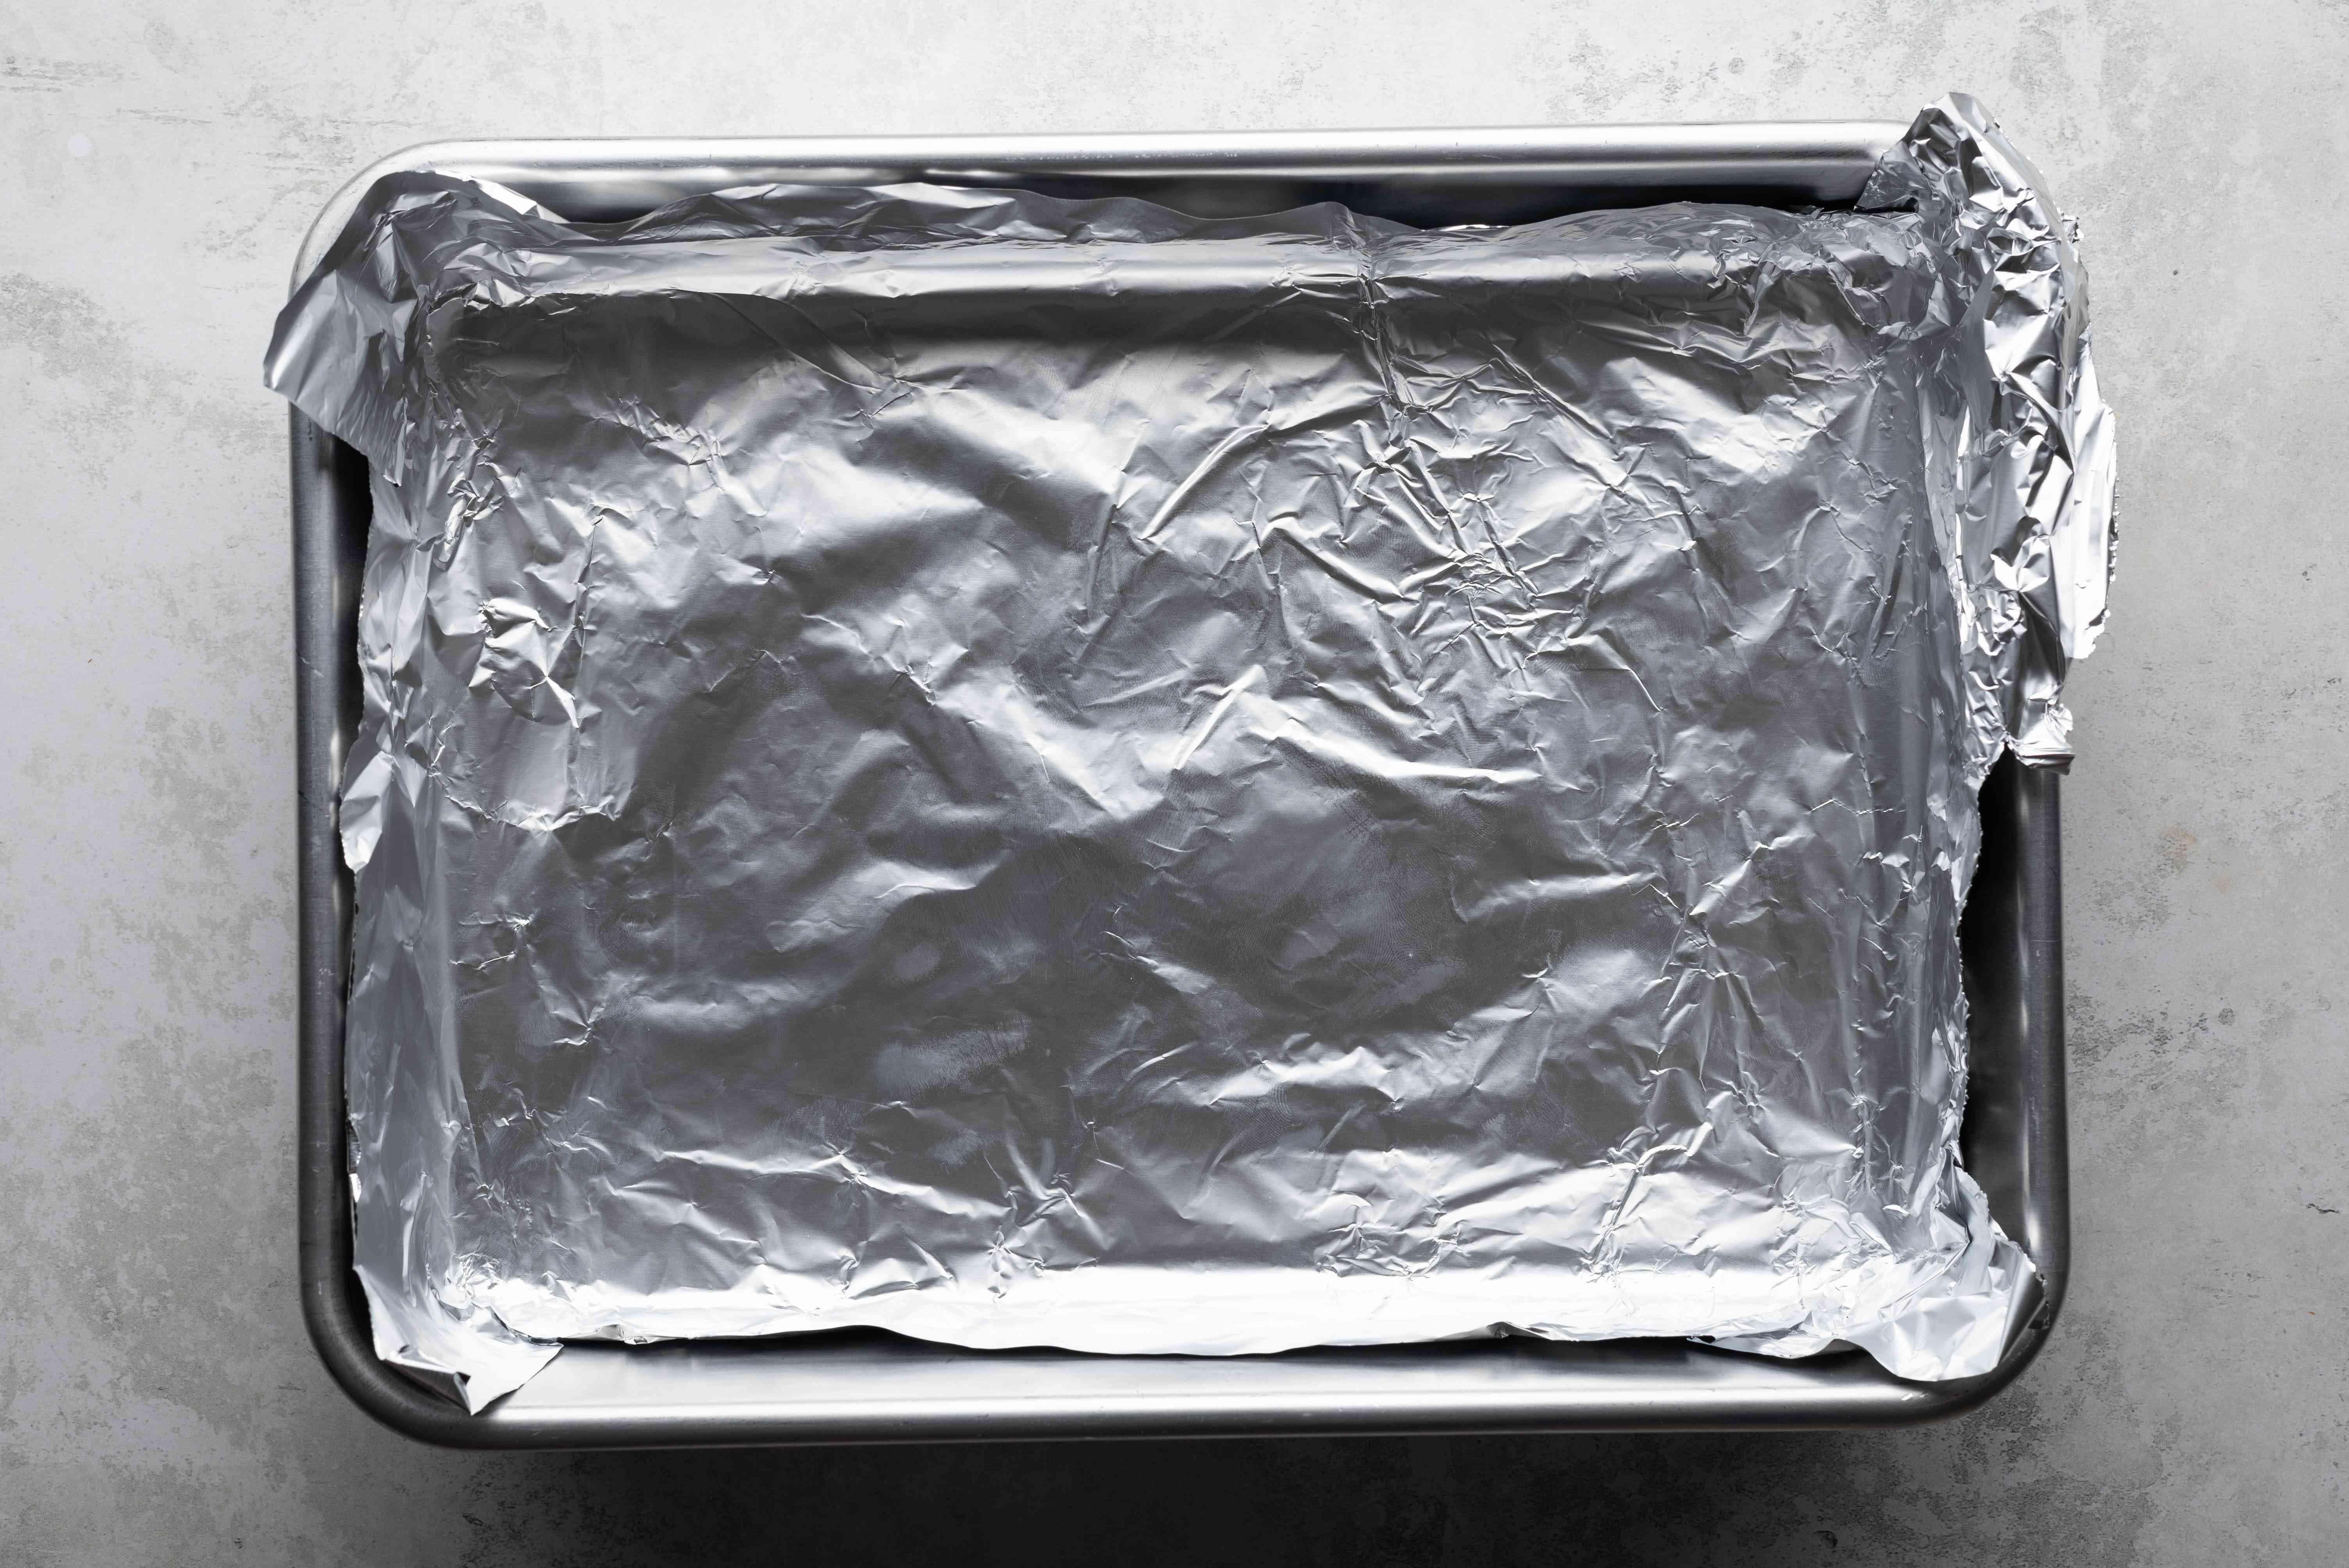 aluminum foil baking pan